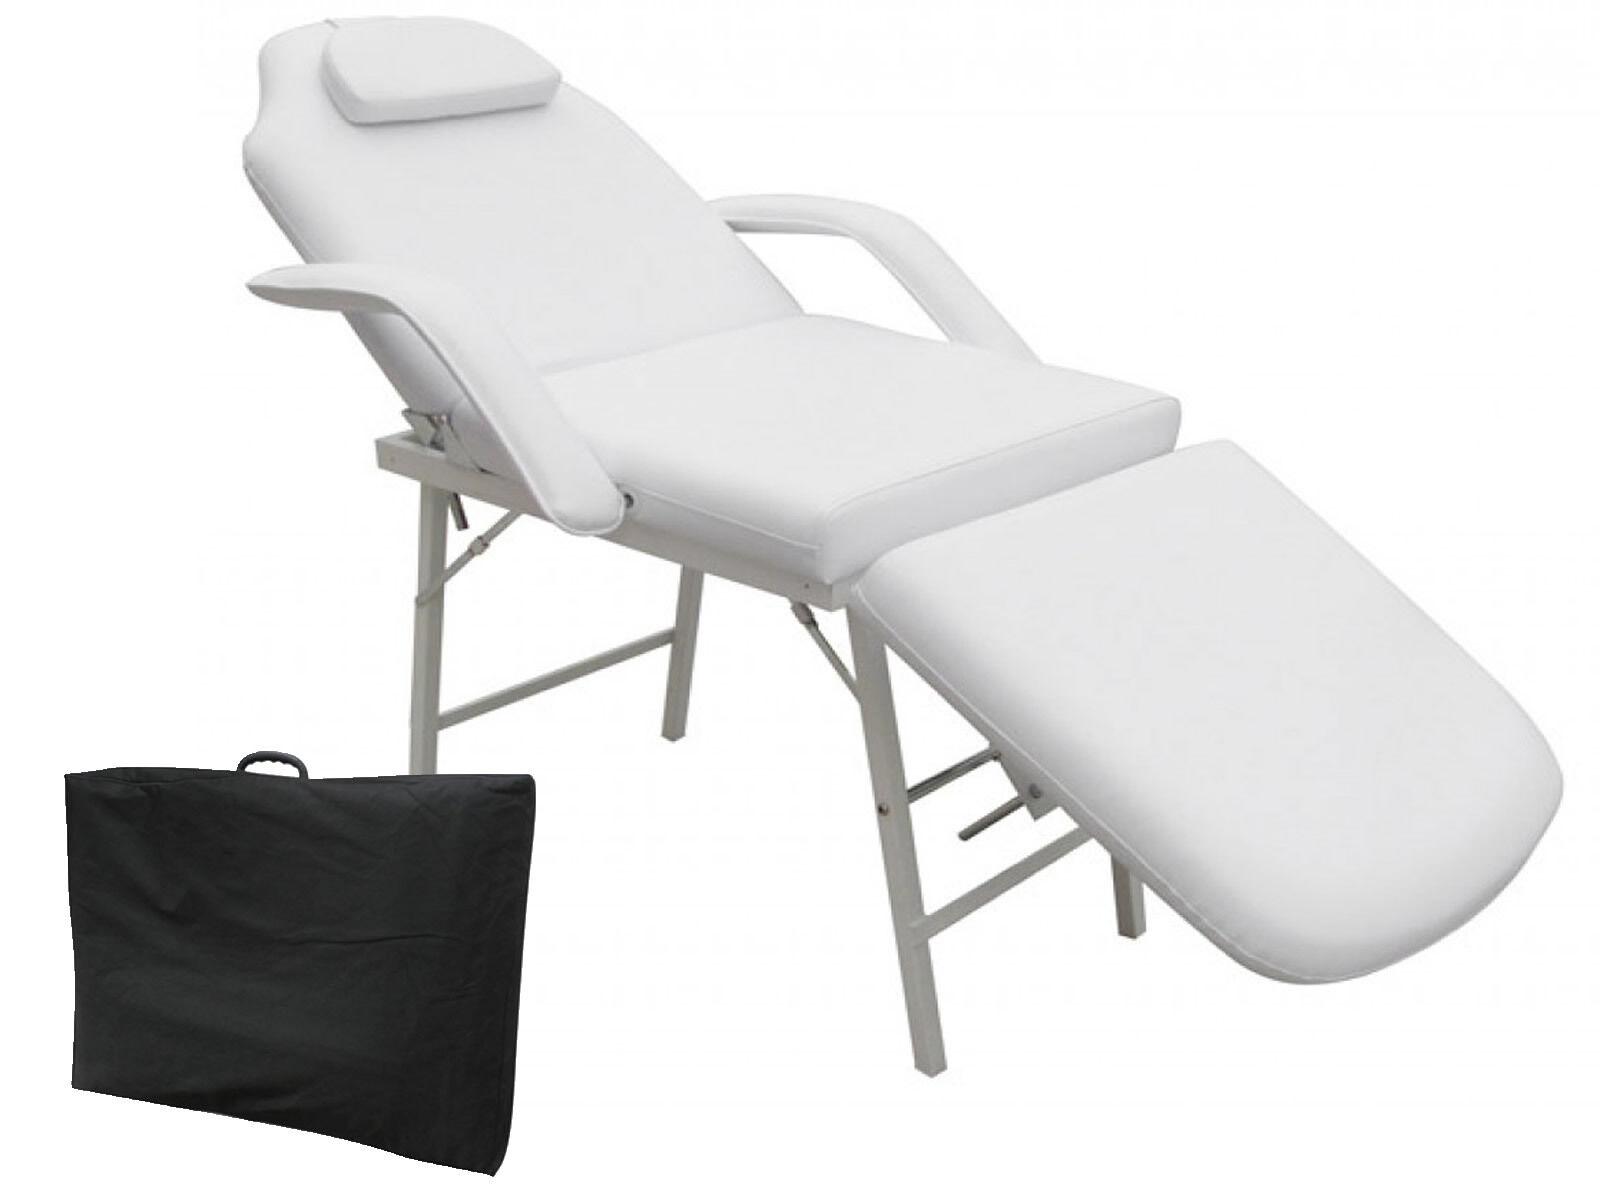 73 Portable Tattoo Parlor Spa Salon Facial Bed Beauty Massage